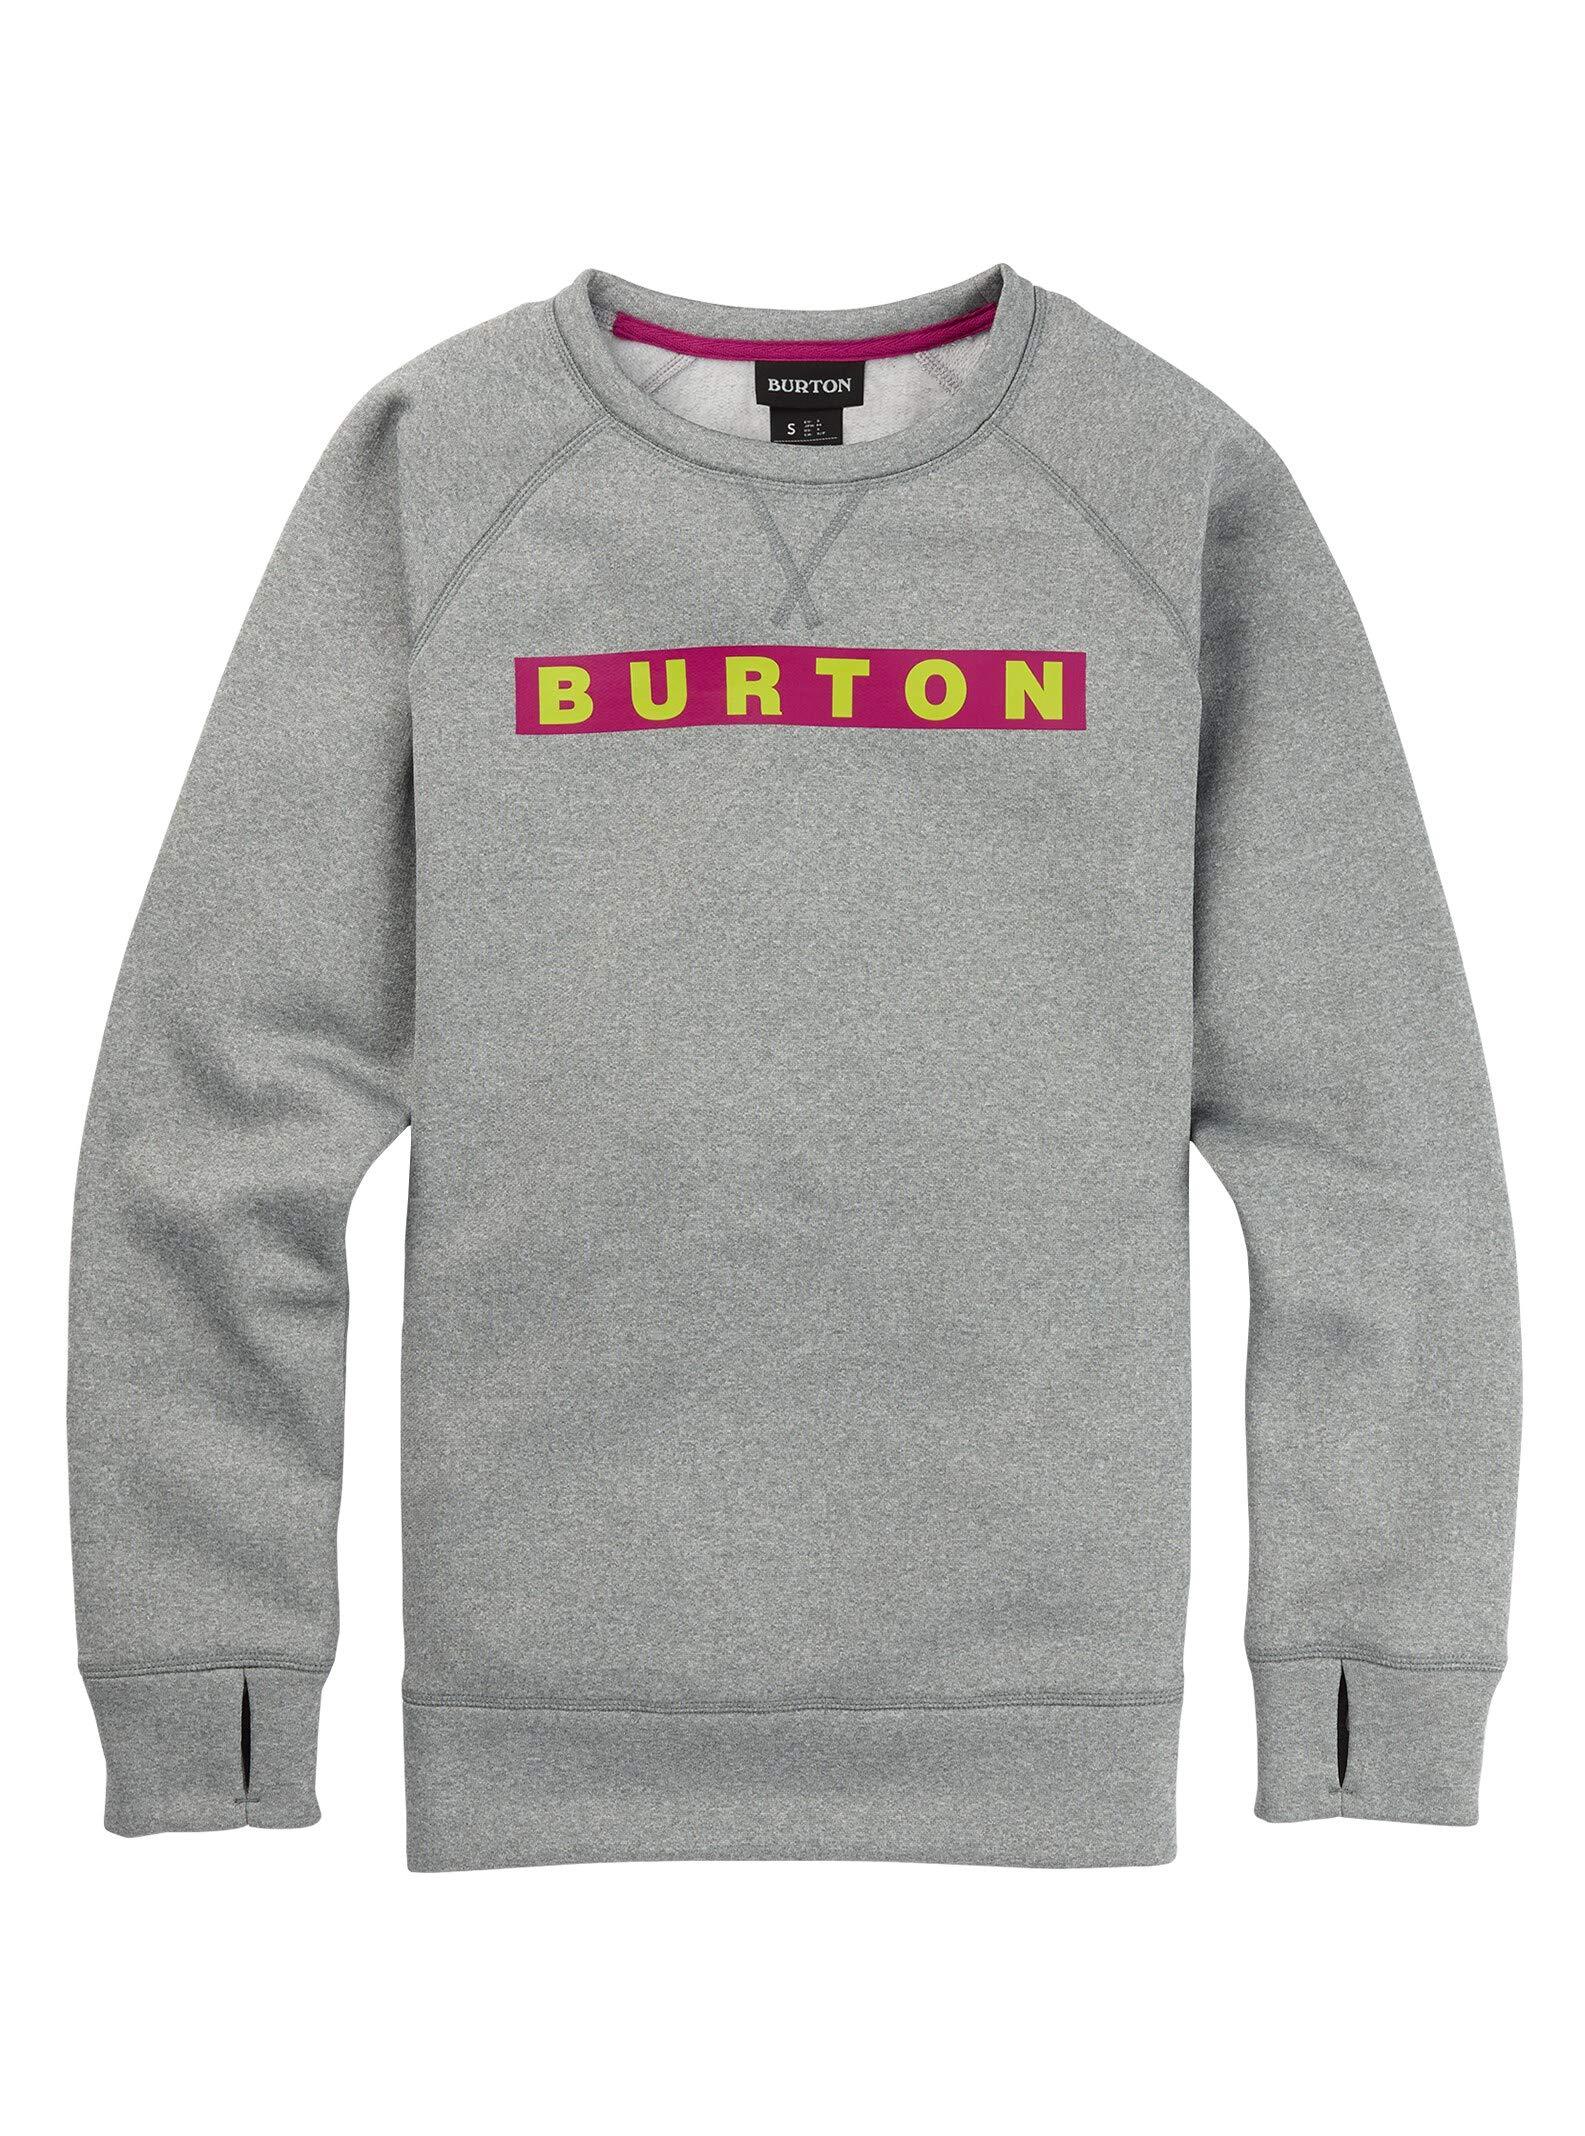 Burton Women's Oak Crew Sweatshirt, Gray Heather, Medium by Burton